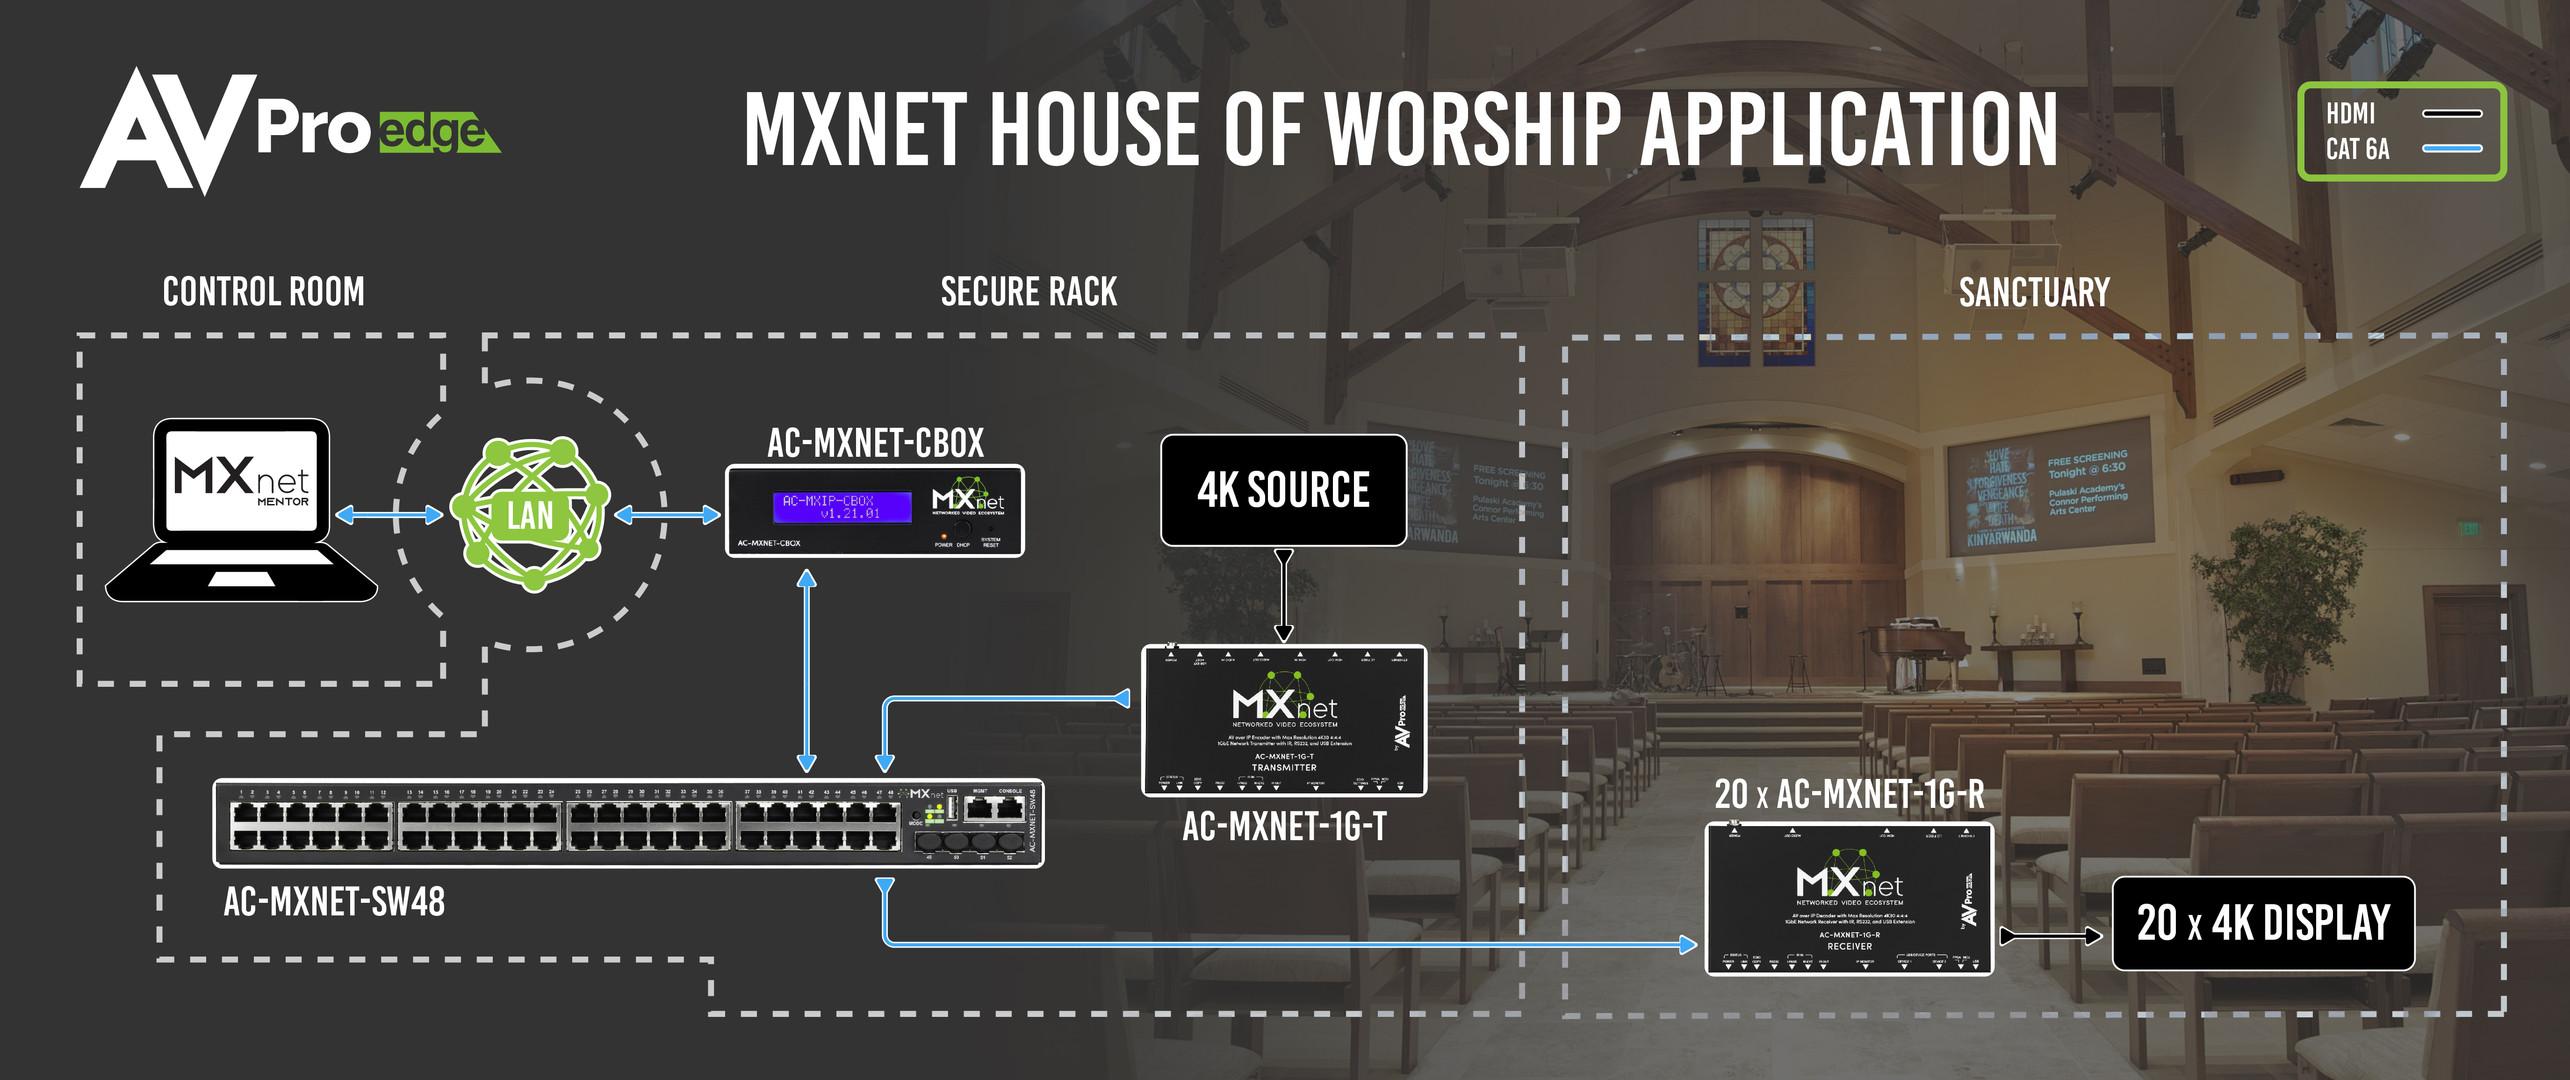 MX Net House of Worship Application-01.j